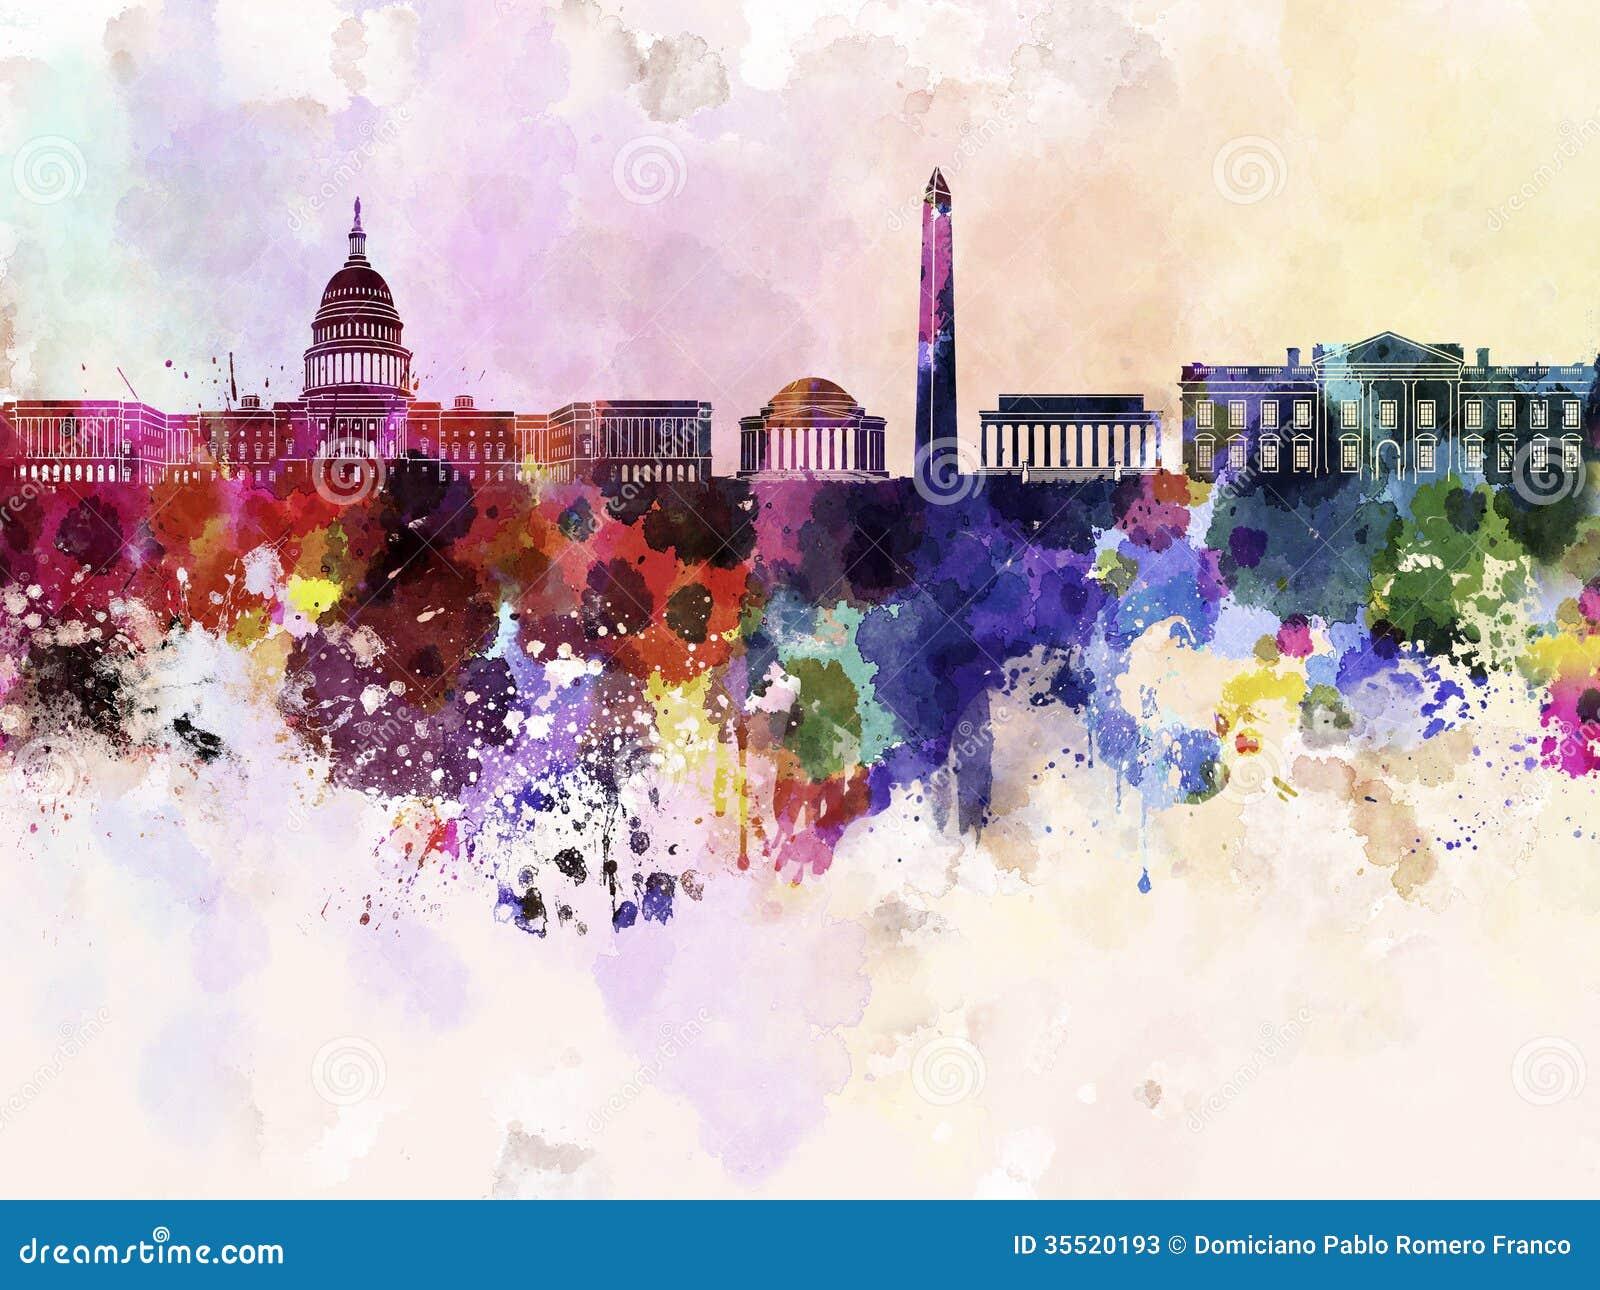 Washington Dc Skyline In Watercolor Background Stock